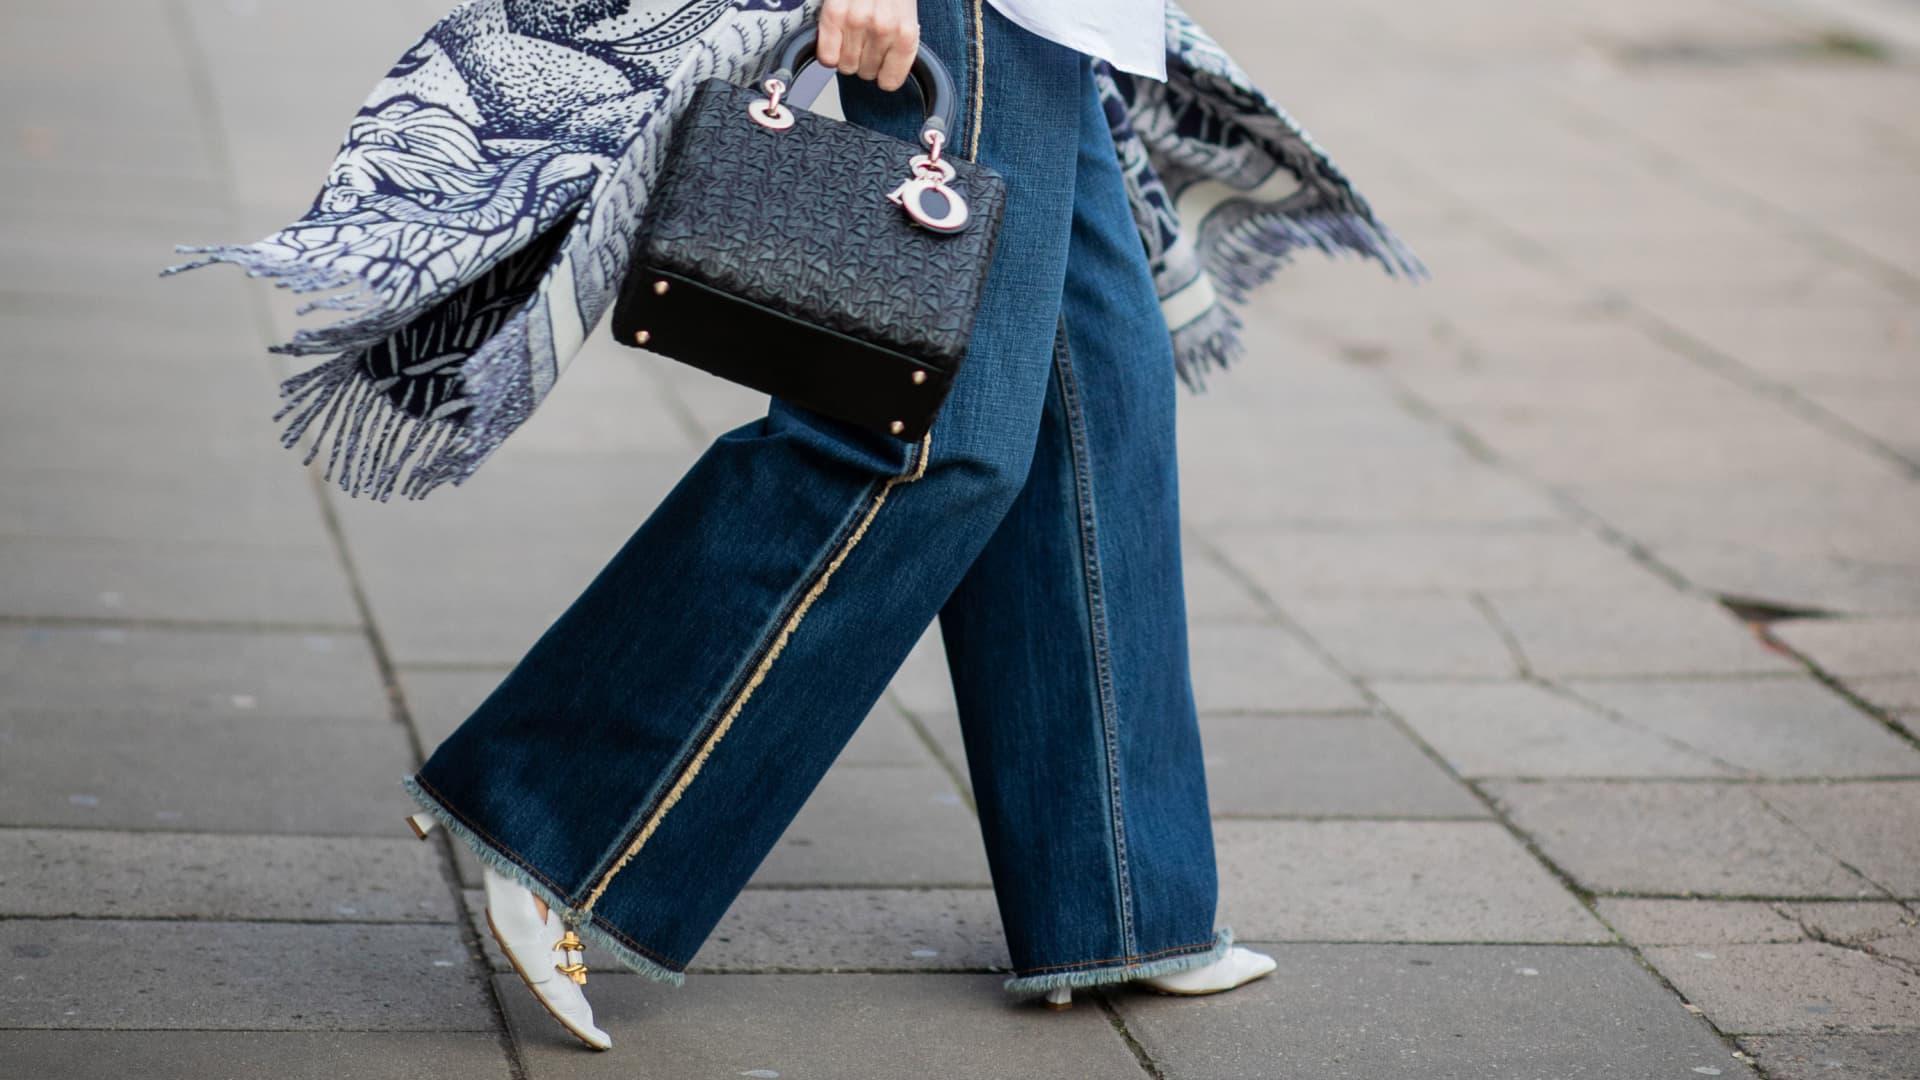 Alexandra Lapp is seen wearing white shoes Bottega Veneta, wide leg denim jeans during the Berlin Fashion Week Autumn/Winter 2020 on January 15, 2020 in Berlin, Germany.